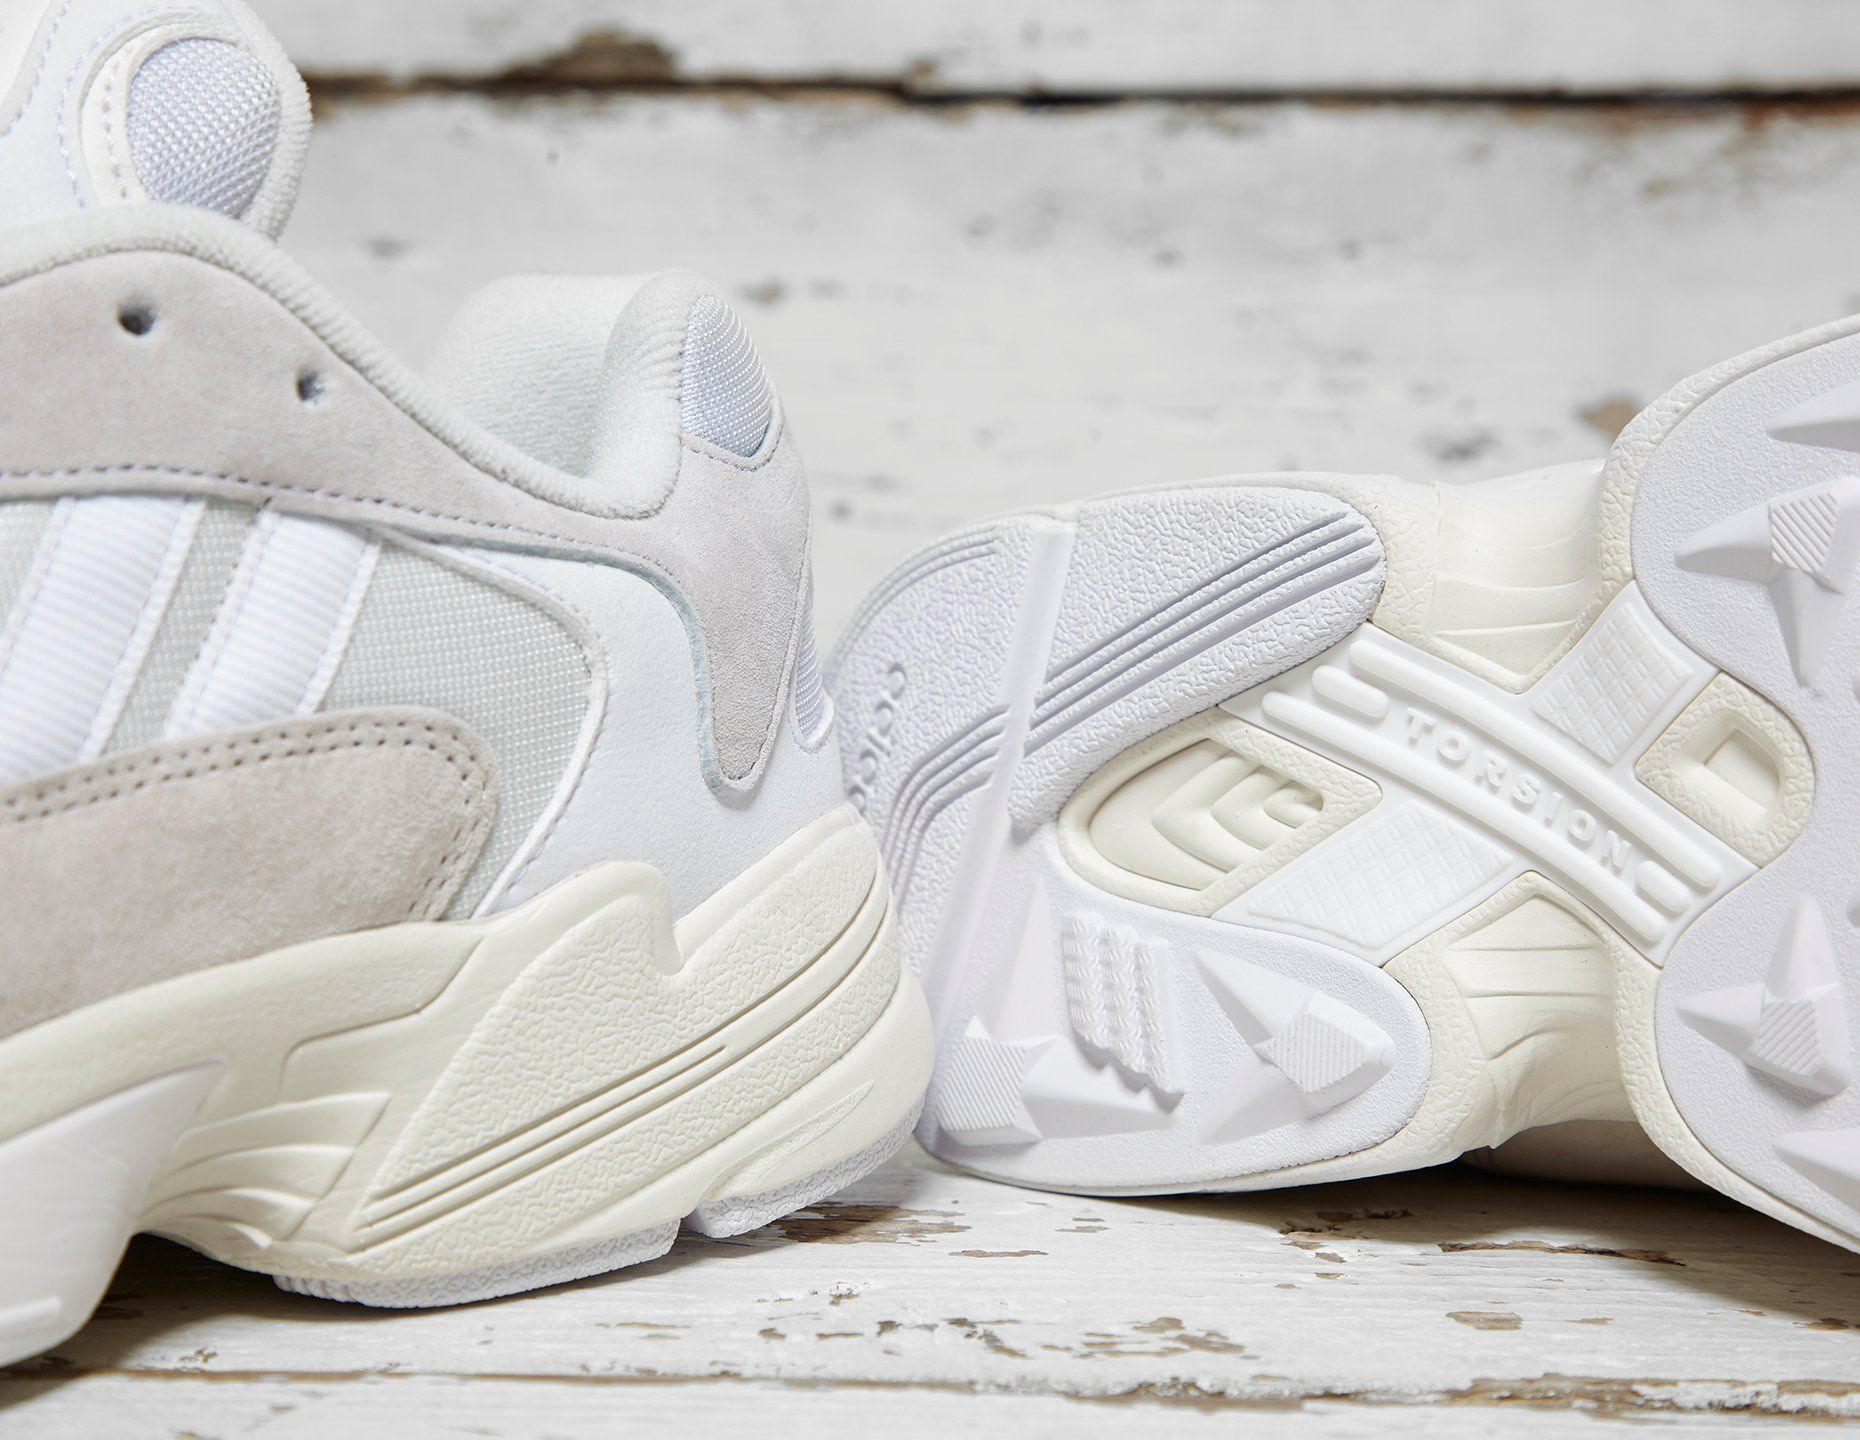 Adidas Originals Yung 1 Footpatrol